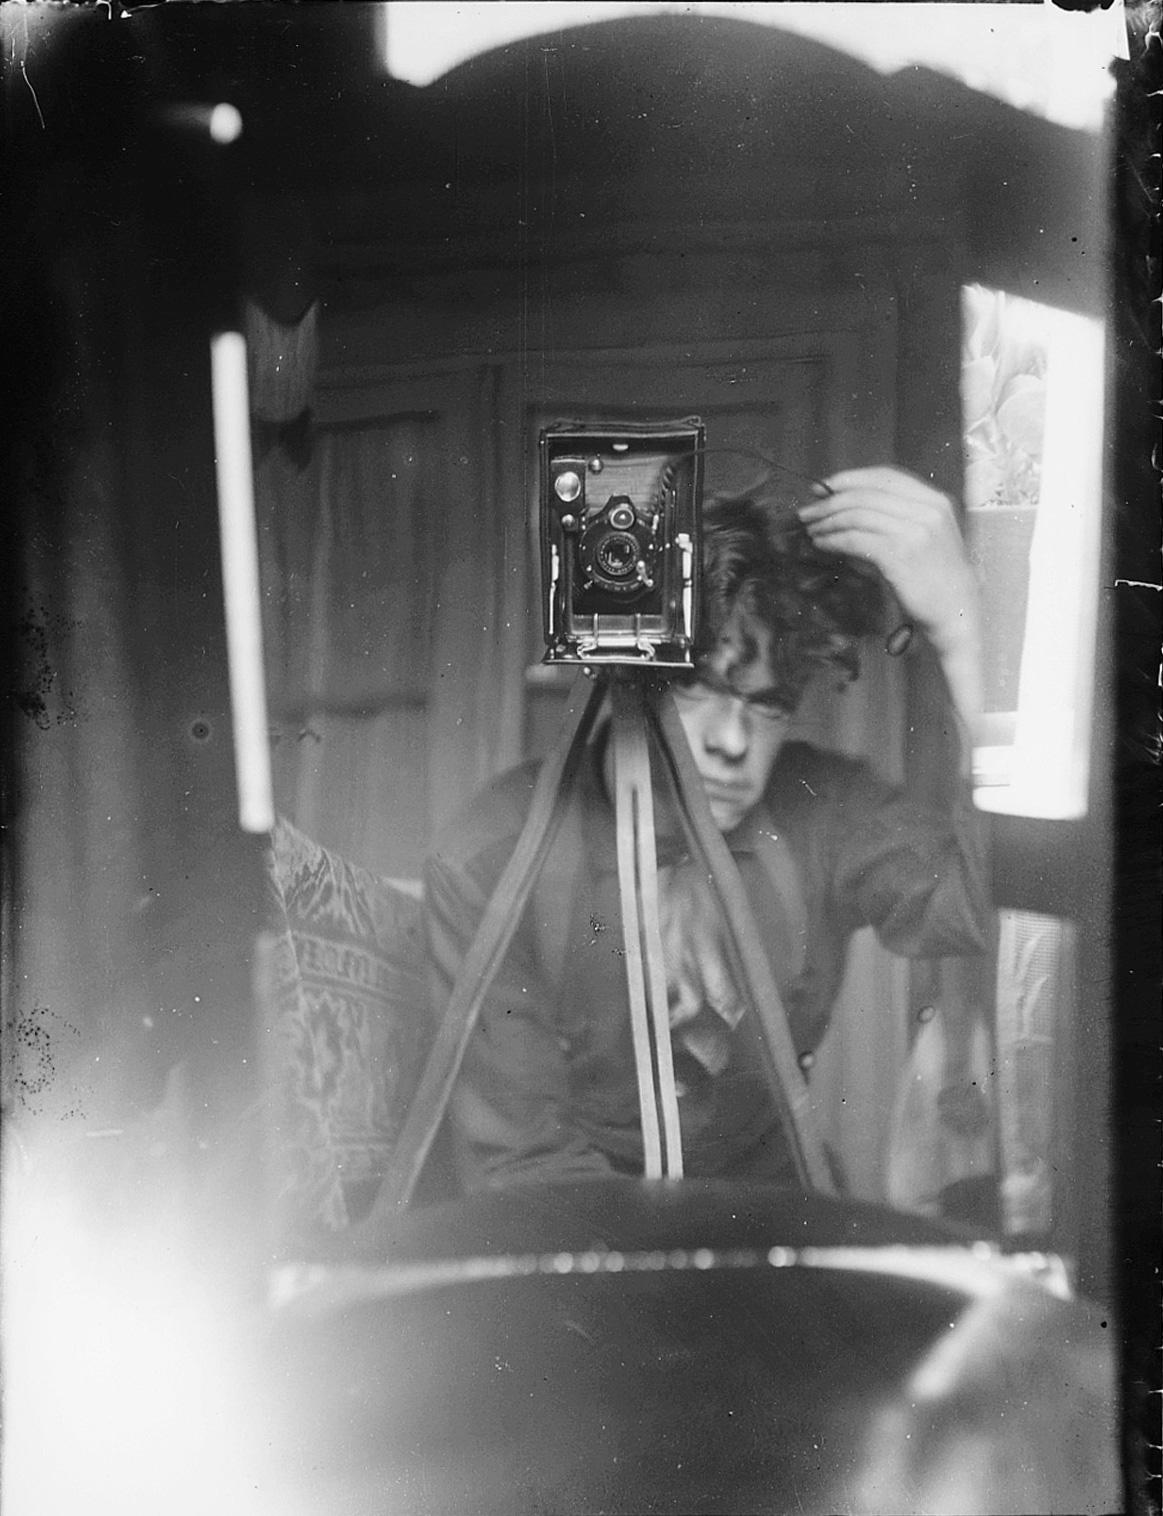 Melle schilder | zelfportret in spiegel, glasnegatief op fotopapier